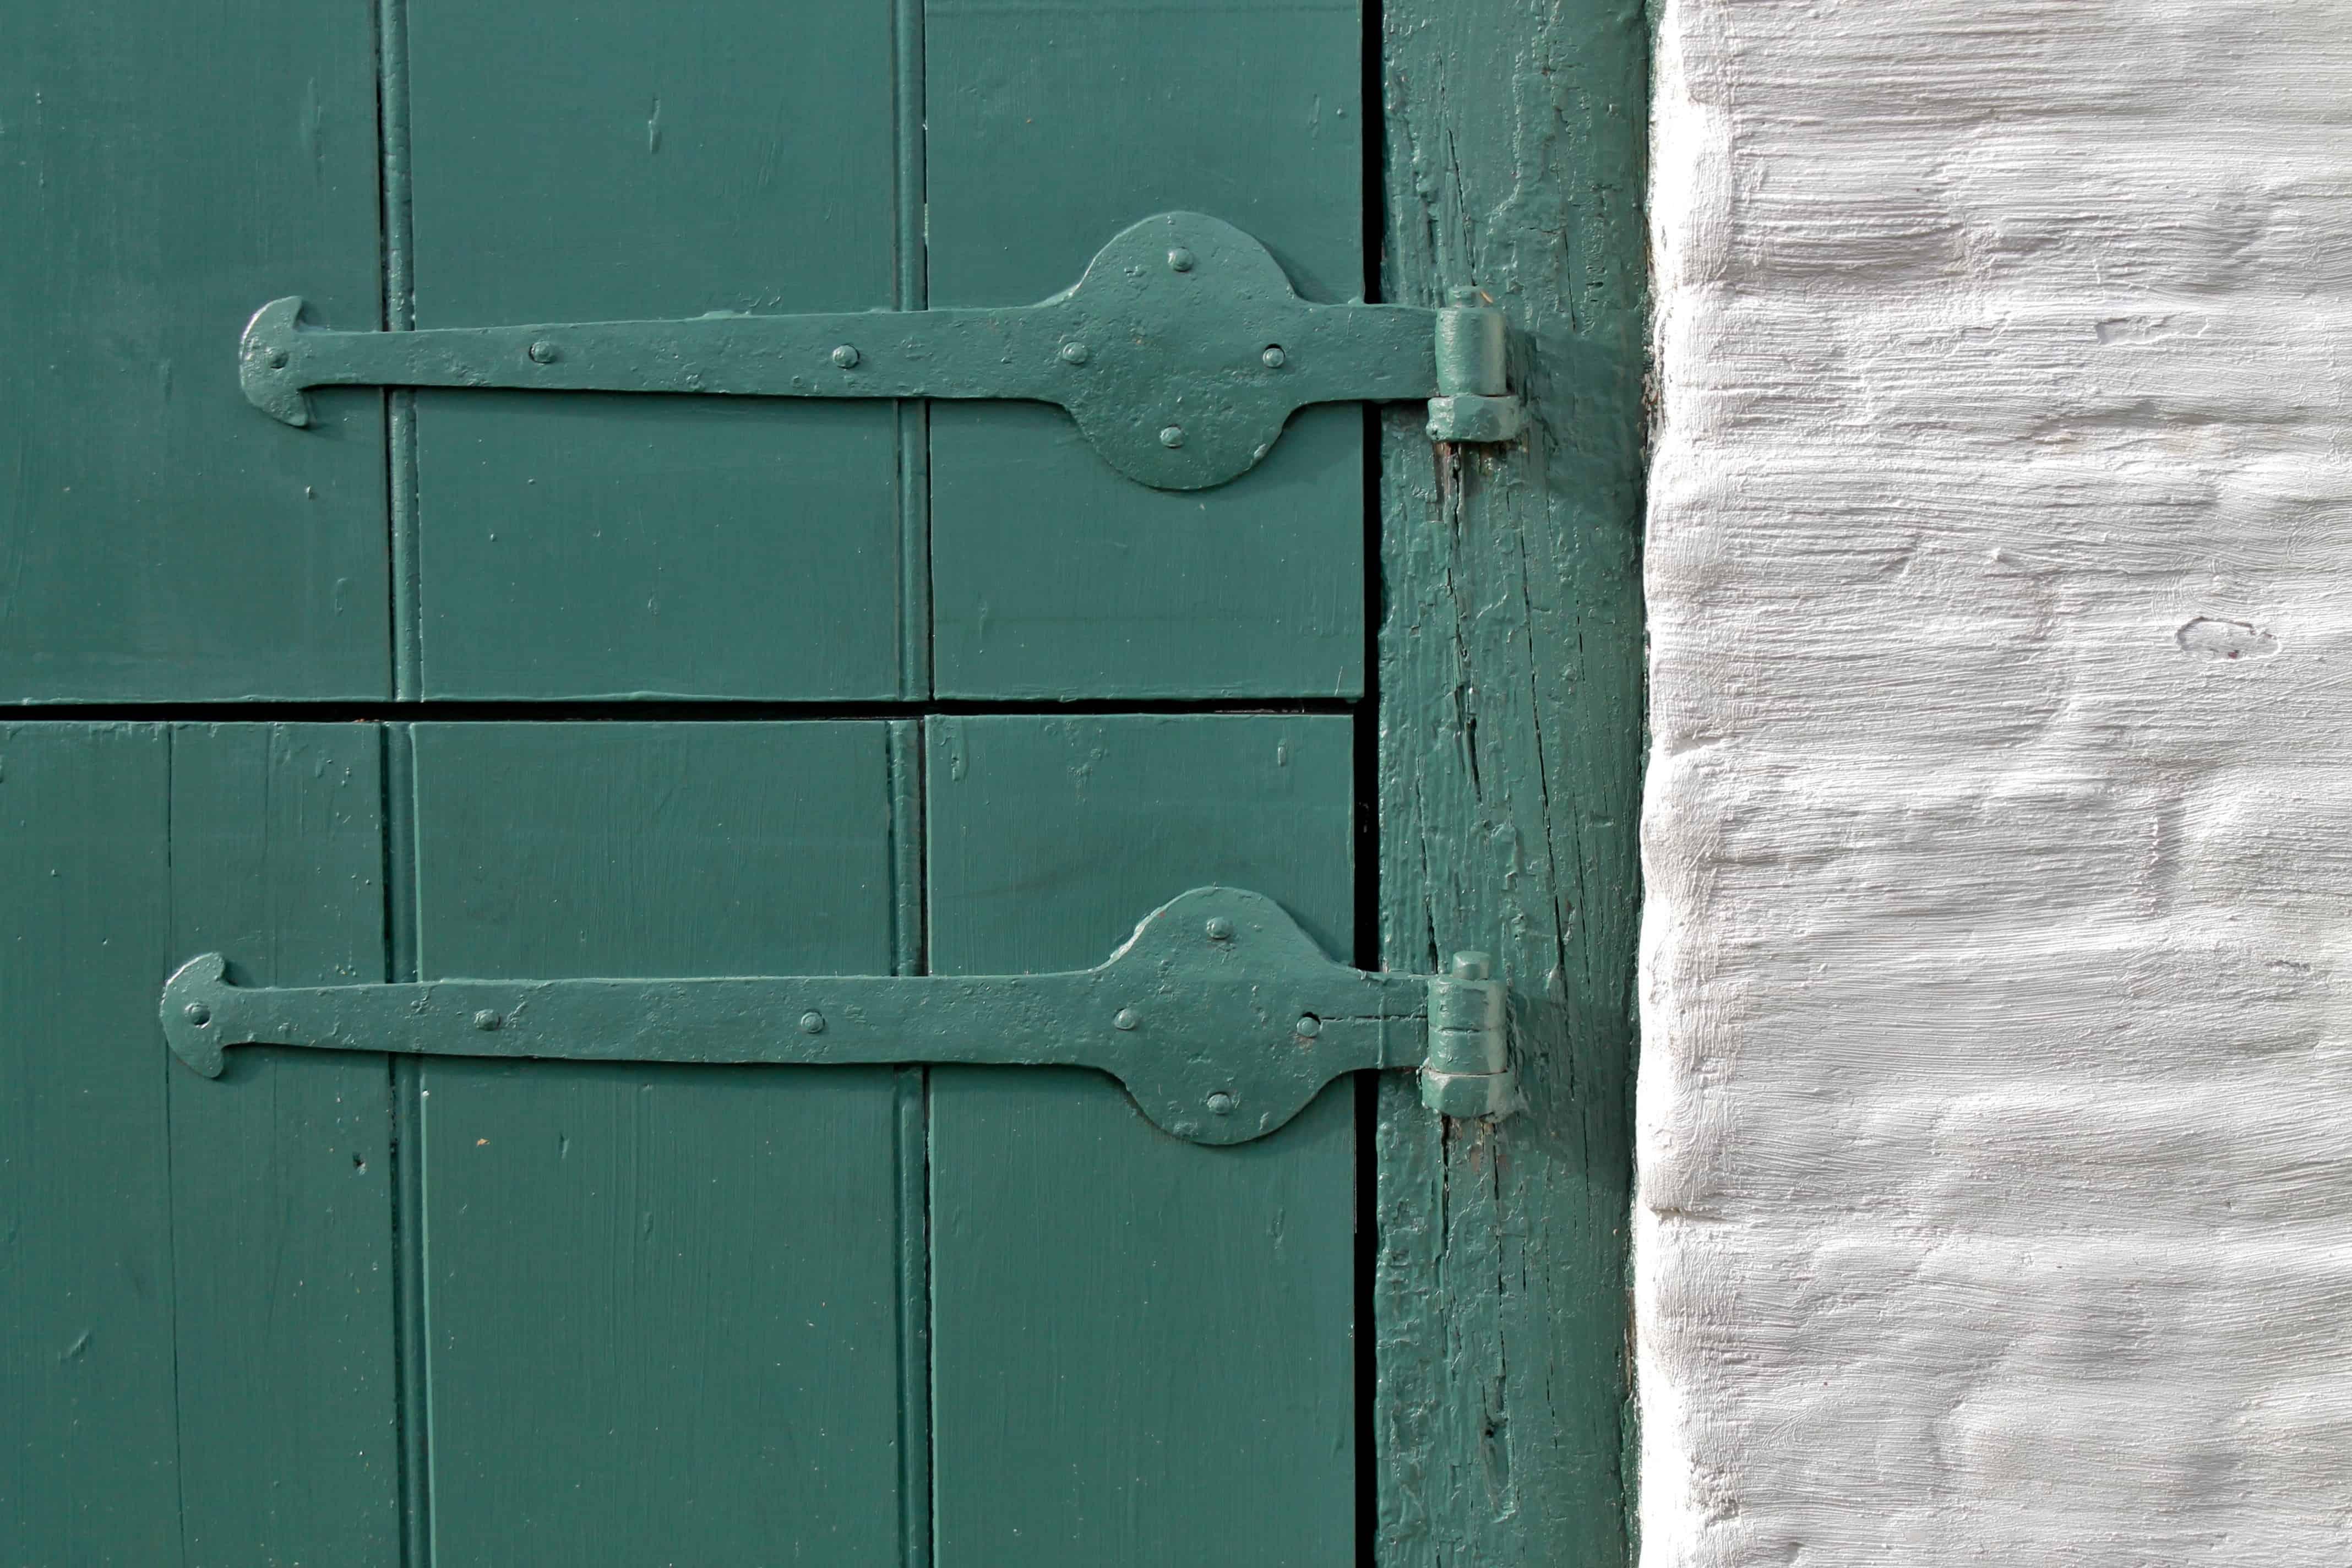 Mabee Farm Green Door, White Brick